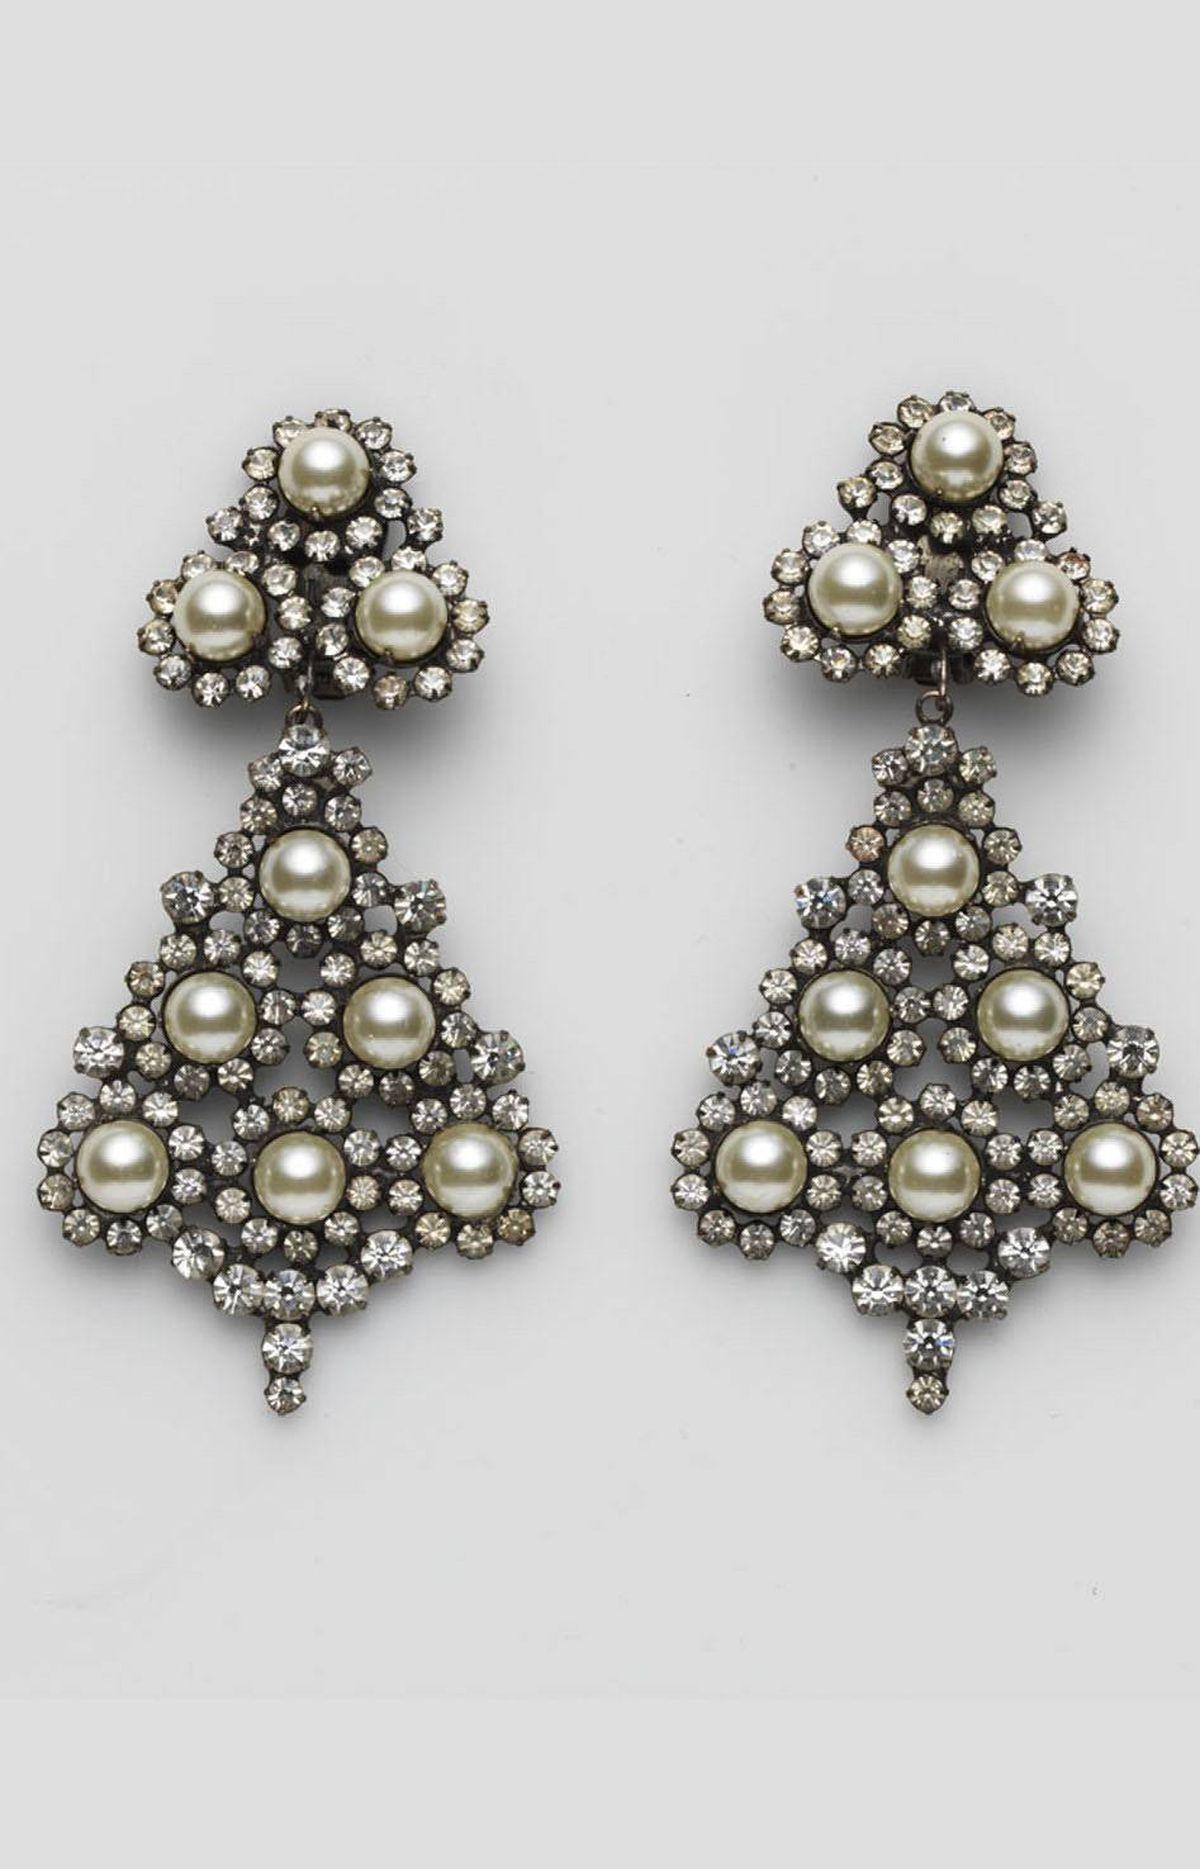 Clip-on earrings by Carole Tanenbaum Vintage Collection, $1,200 through www.caroletanenbaum.com.